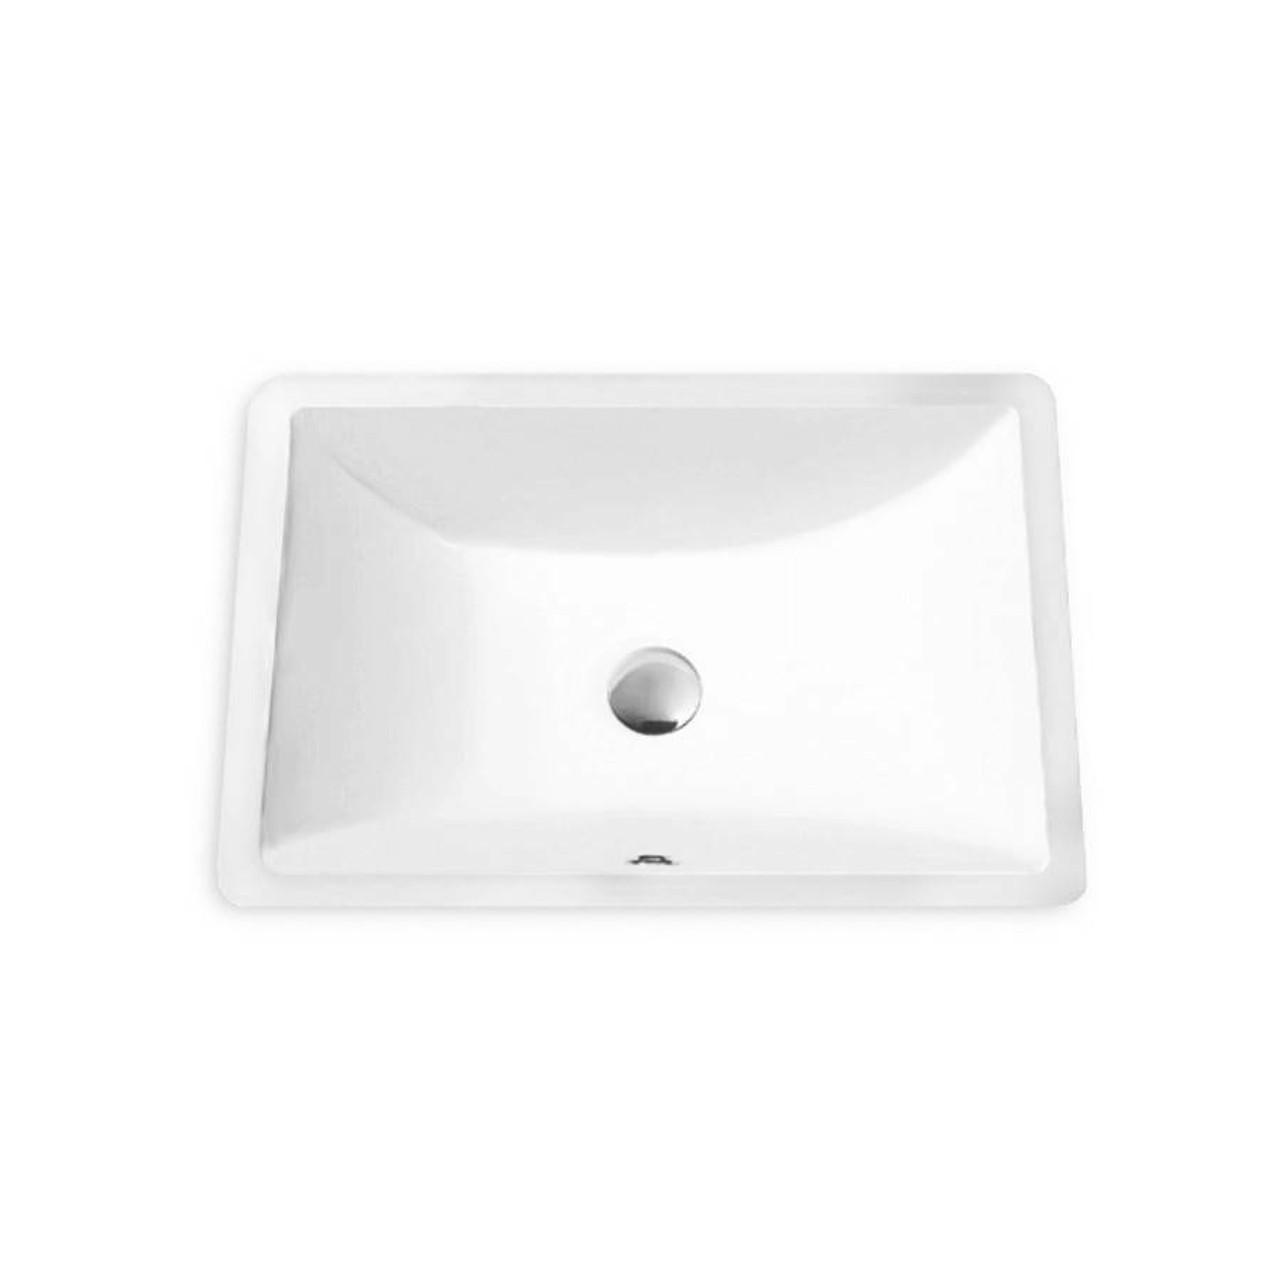 Fresno Undermount Bathroom Basin The Sink Warehouse